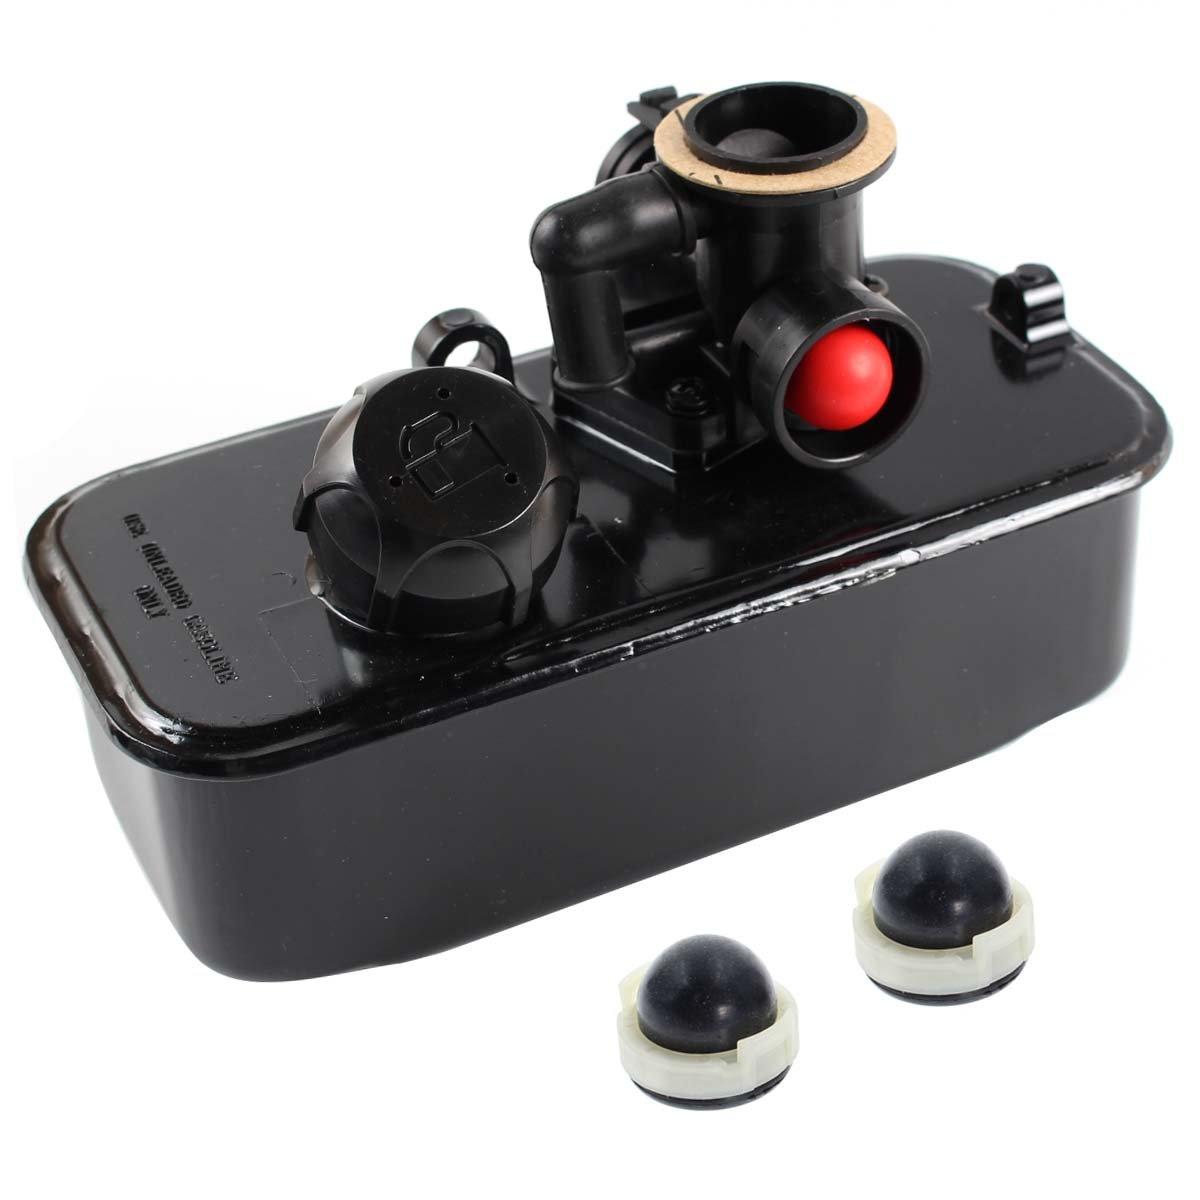 Carbhub 494406 Fuel Tank and 795477 Carburetor for Briggs & Stratton 498809 498809A 795469 794147 699660 794161 498811 Carb with Primer Bulb by Carbhub